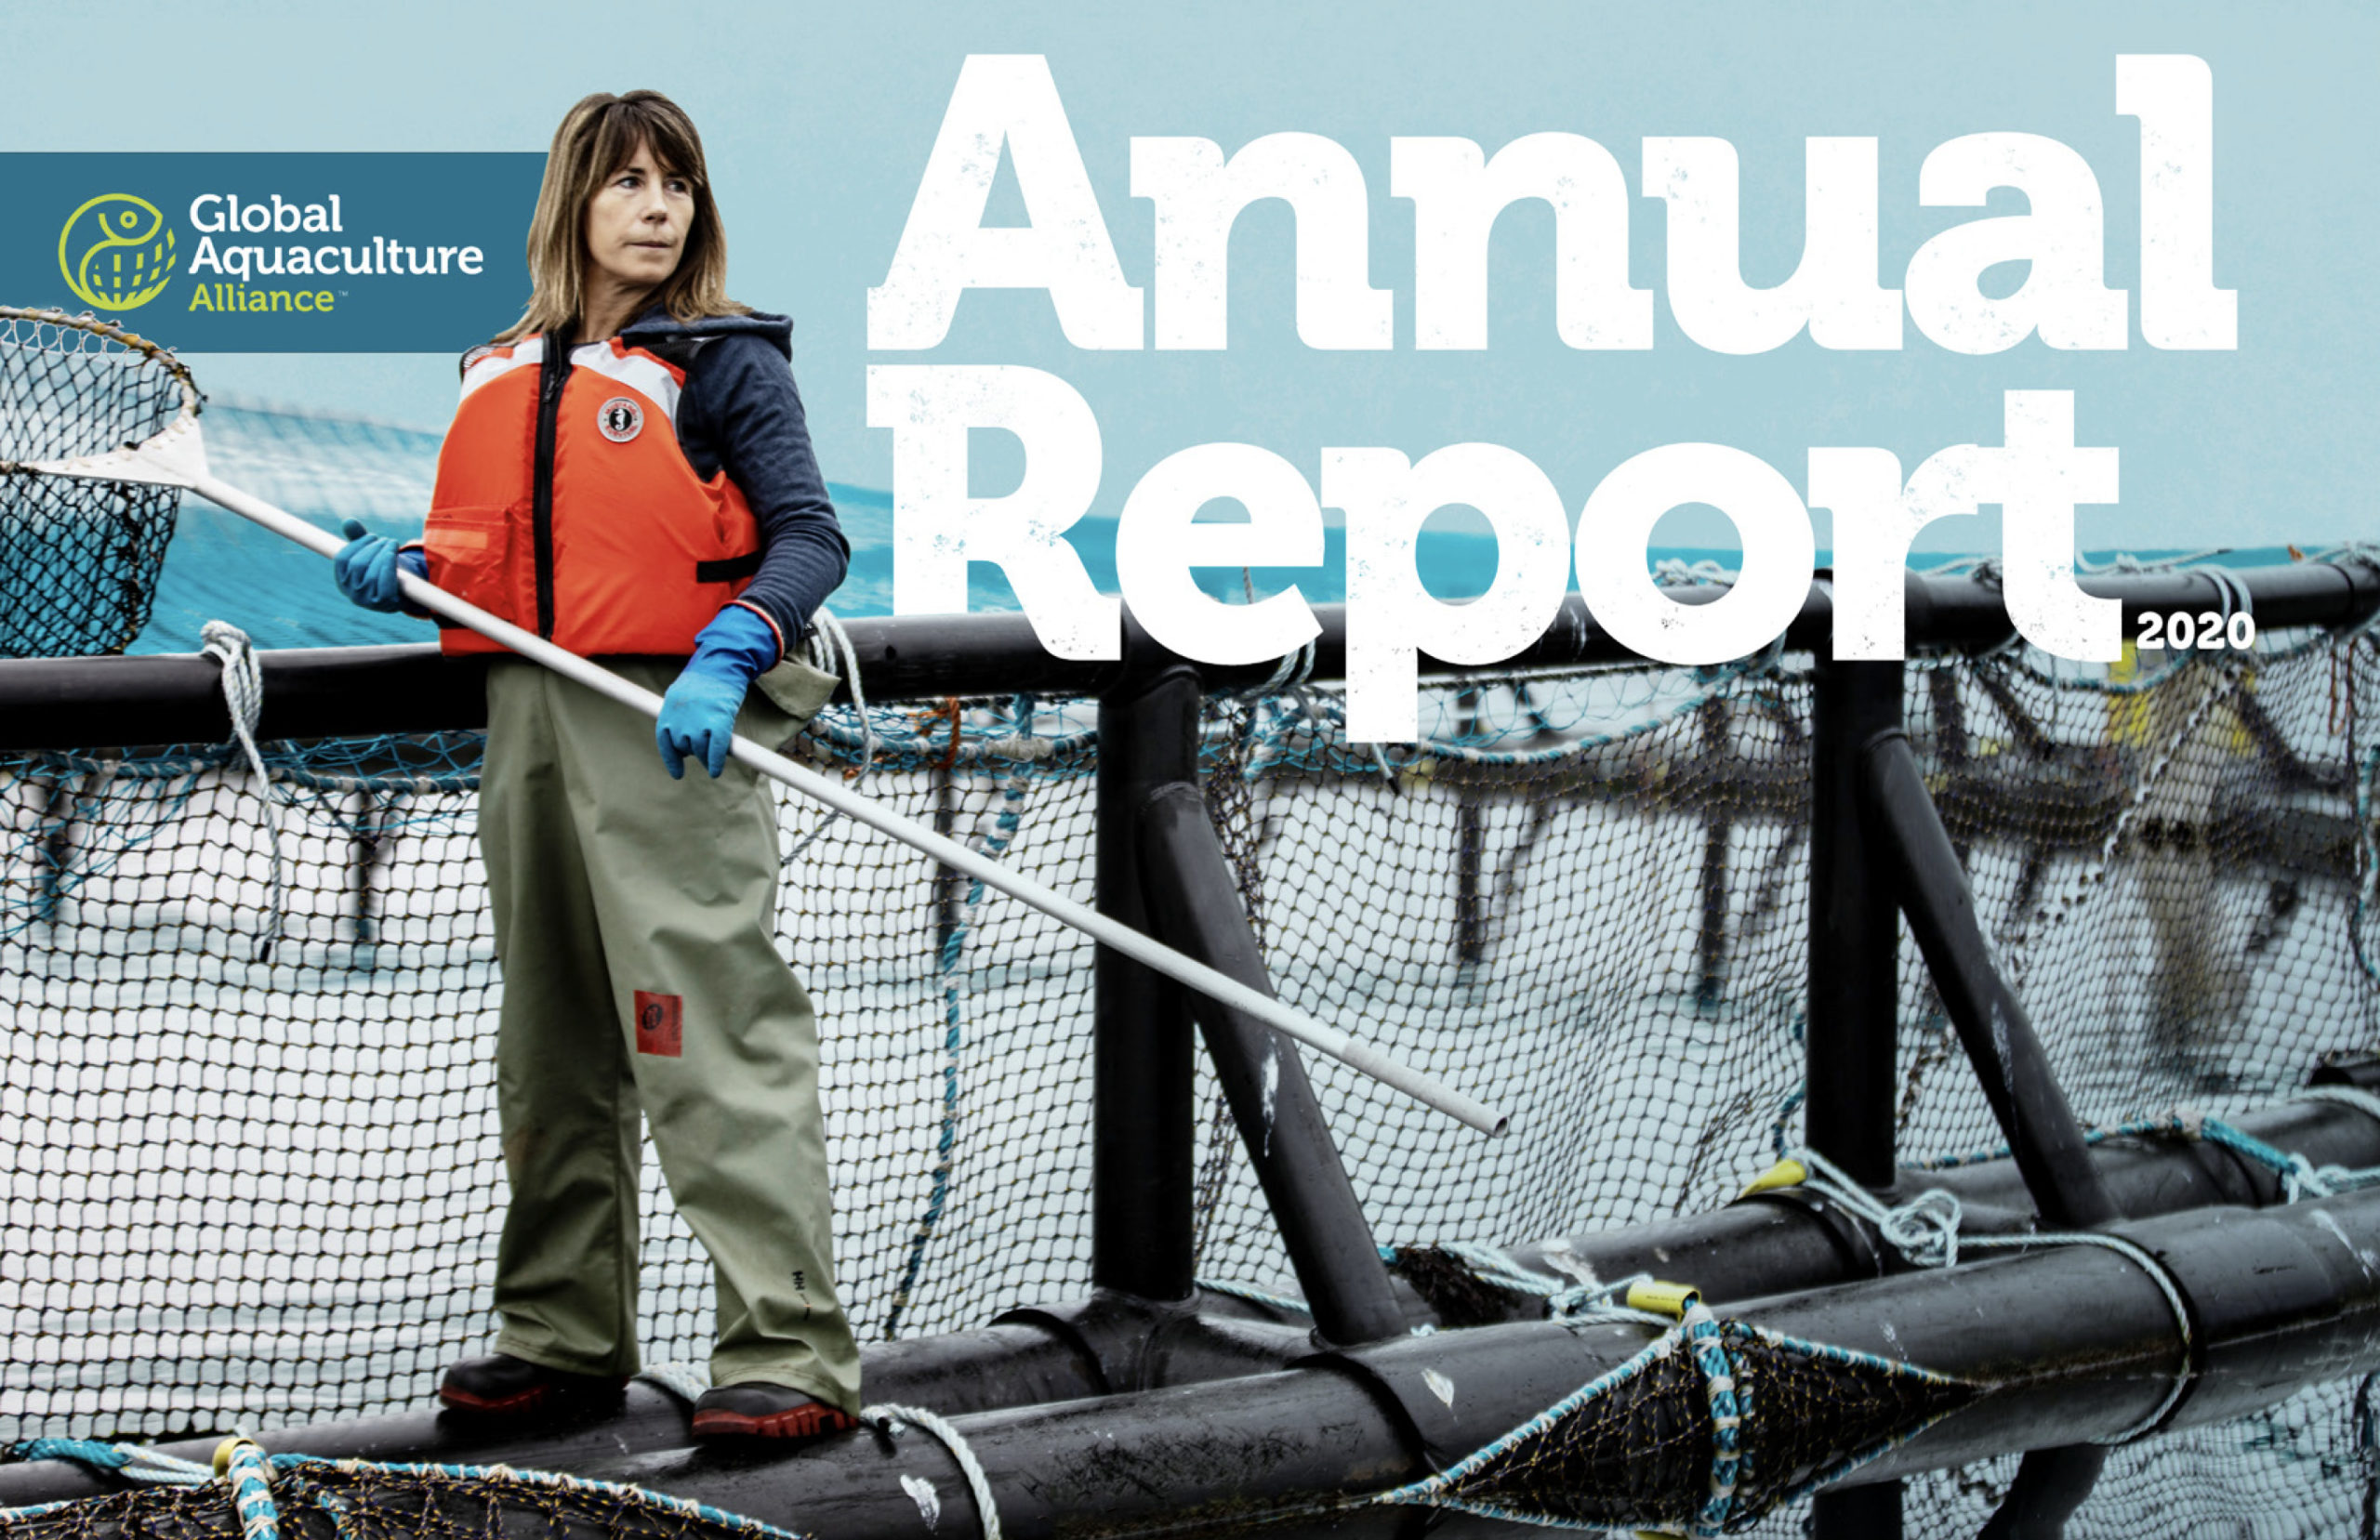 Global Aquaculture Alliance 2020 Annual Report